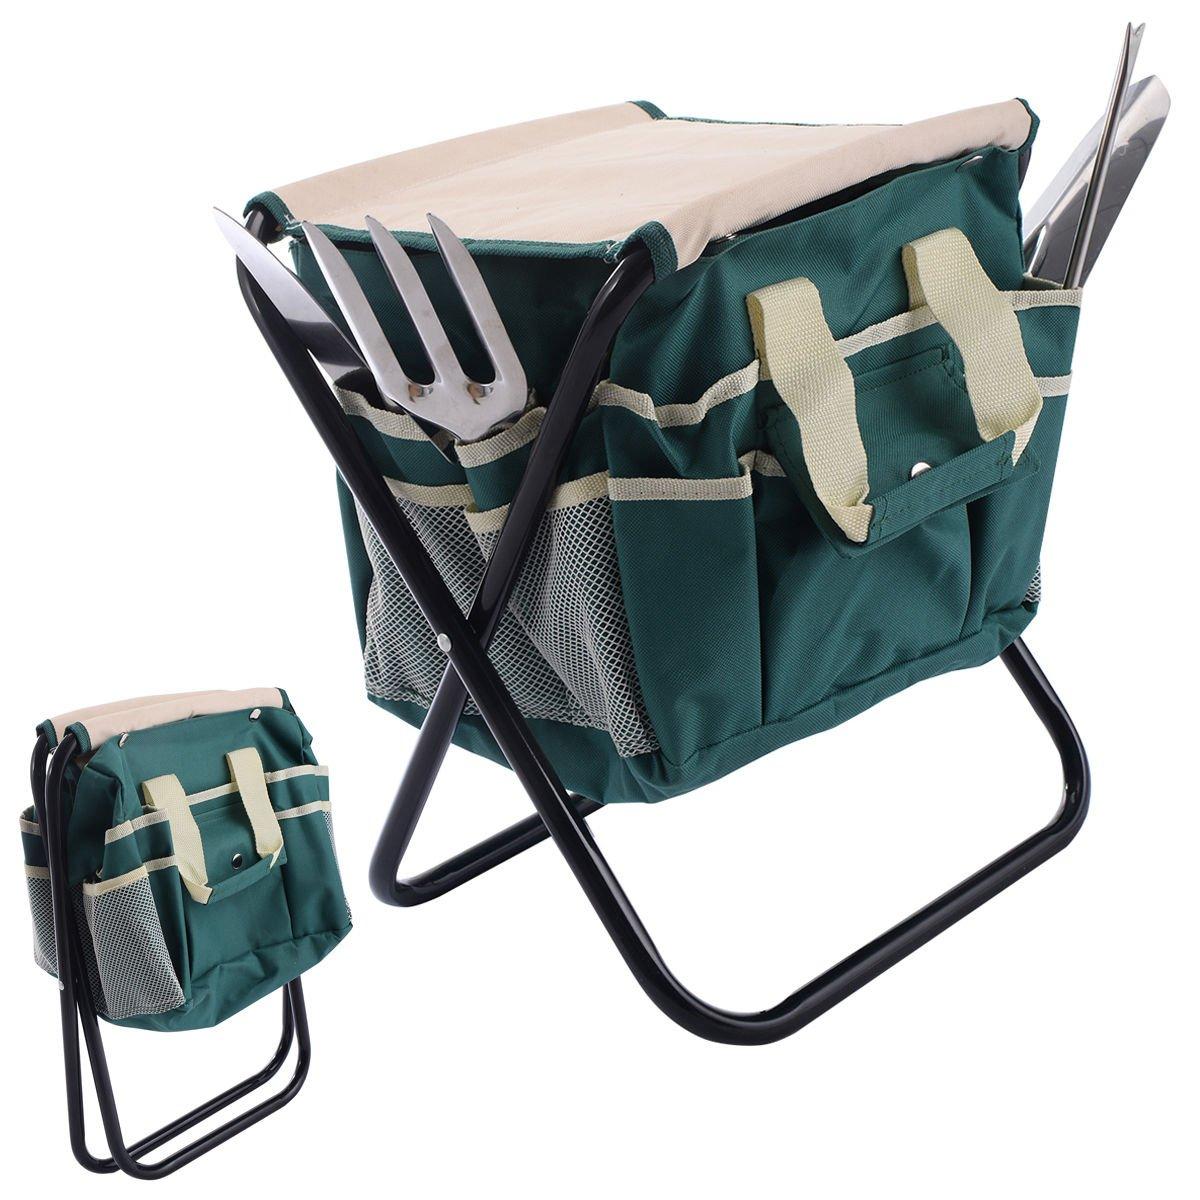 Lightweight and tools gardening stainless steel portable external garden tool bag set folding stool 7 pcs by beautifulwoman